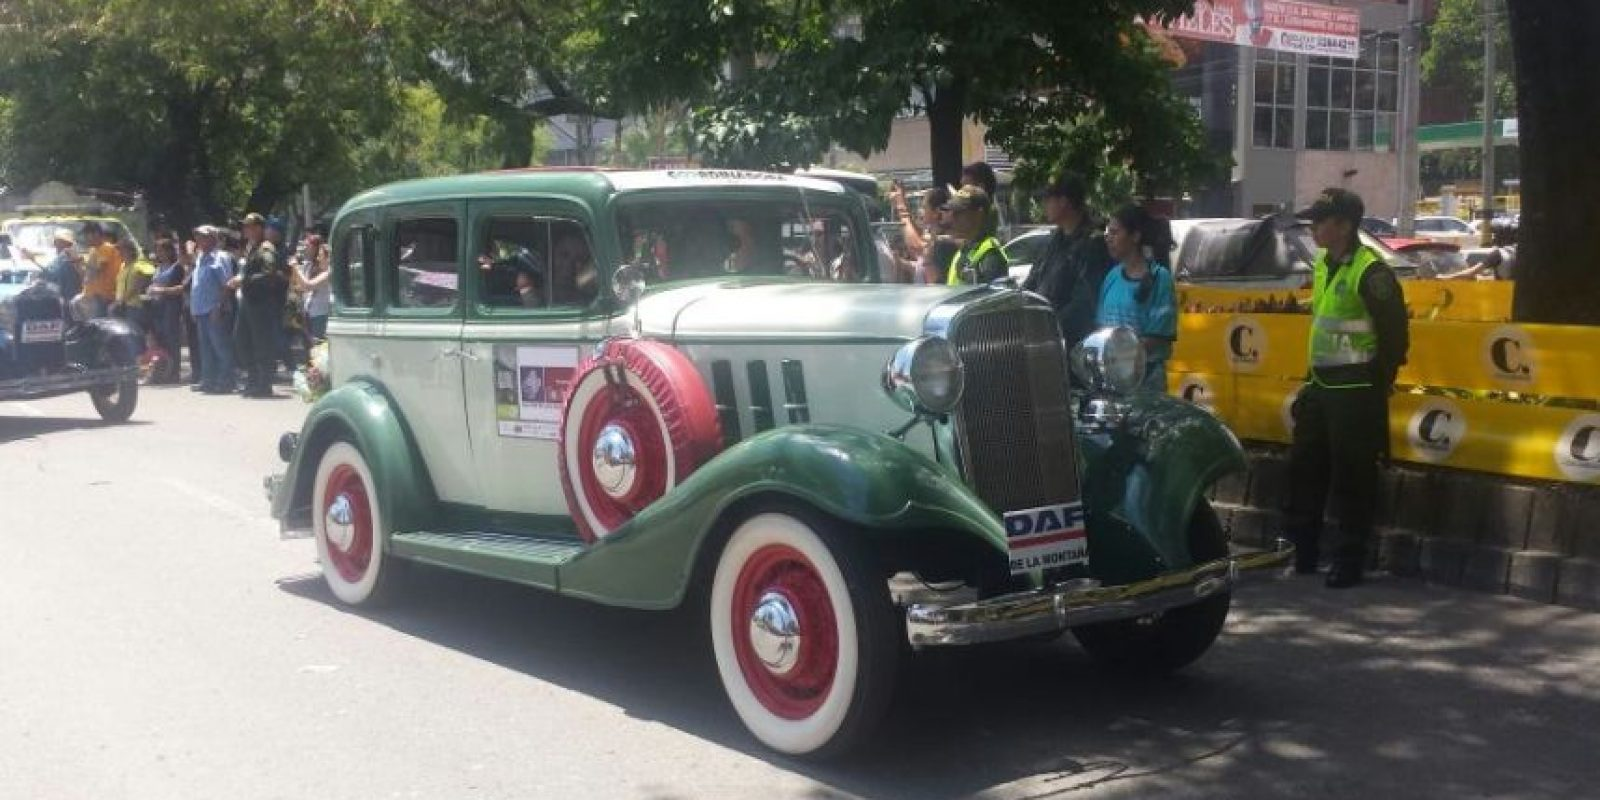 Cadillac 1933 Foto:Ariadne Agámez – Publimetro